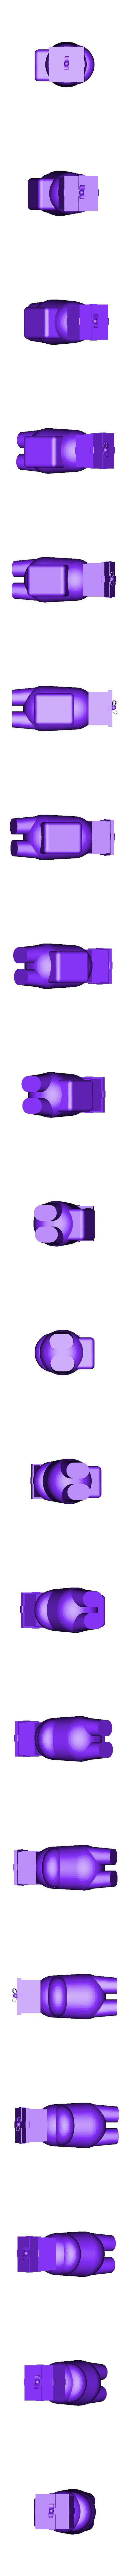 REGALO.stl Download STL file pack 3 of 10 AMONG US + AMONG EXCLUSIVE MR PRESIDENT • 3D printable design, sebastiancabral719